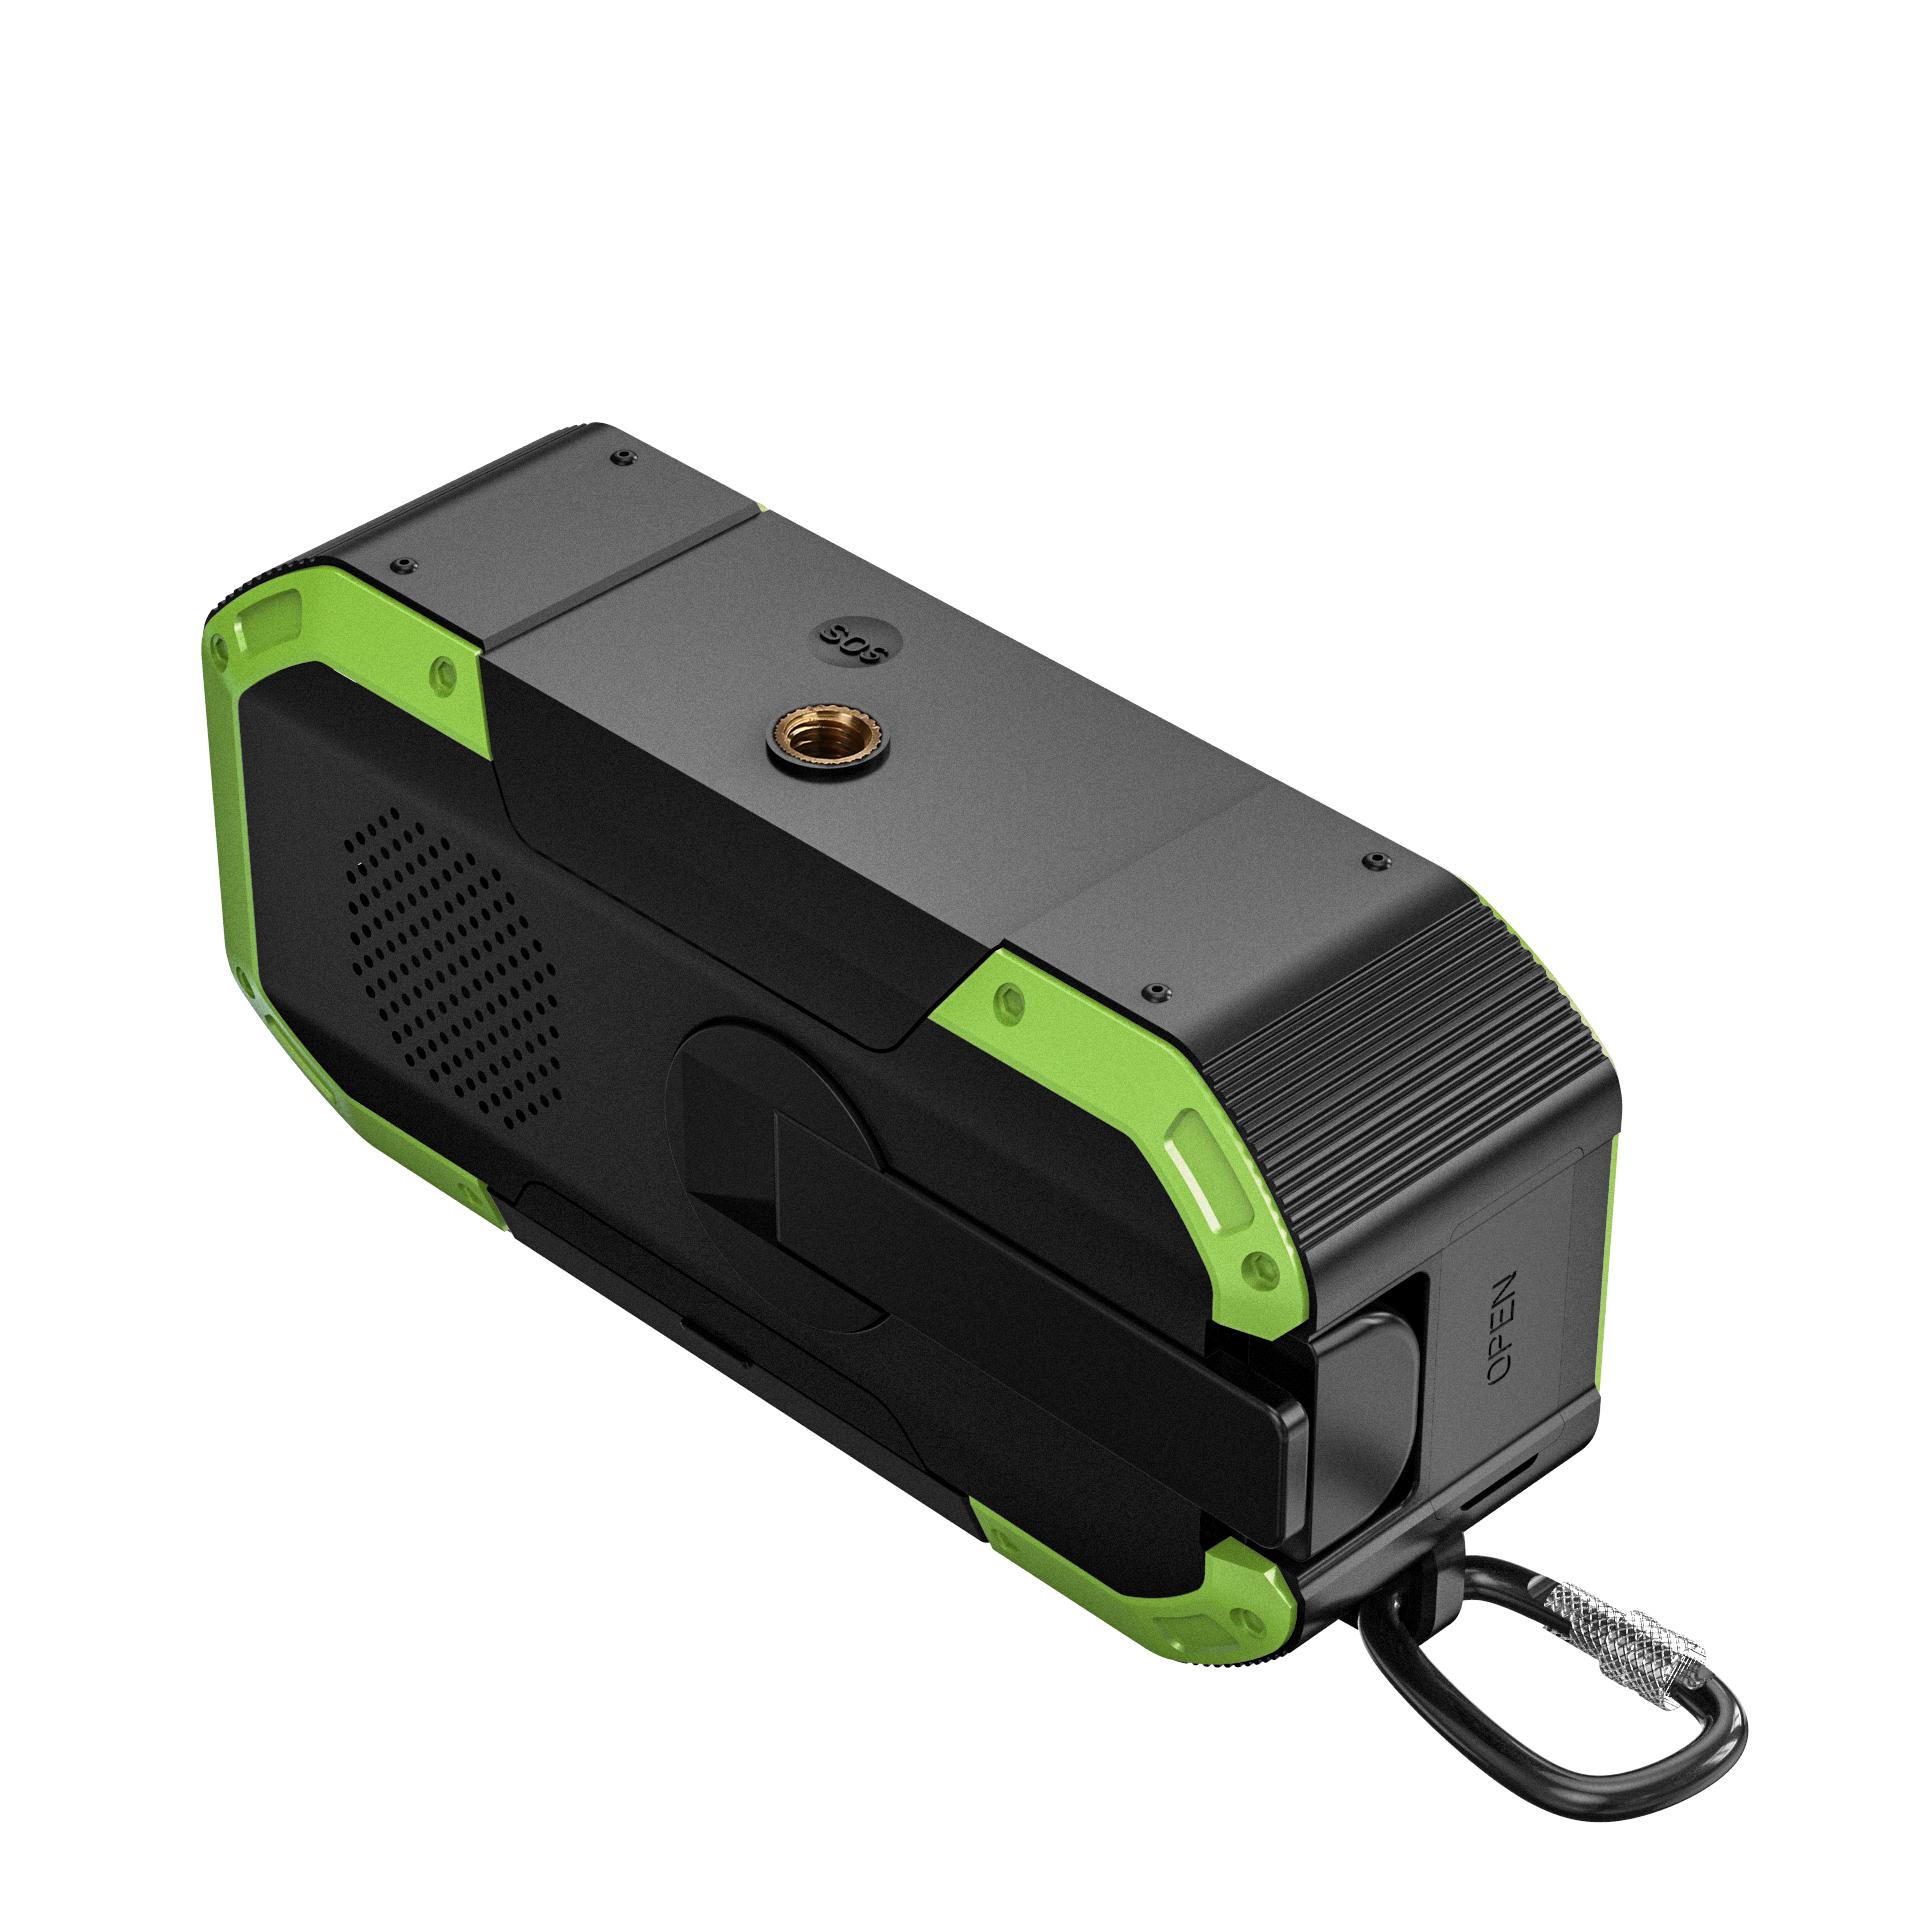 Portable 5000 mAh Power Bank Solar Crank AM/FM/NOAA Emergency 3 in 1 portable radio flashlight solar Radio with Reading Lamp